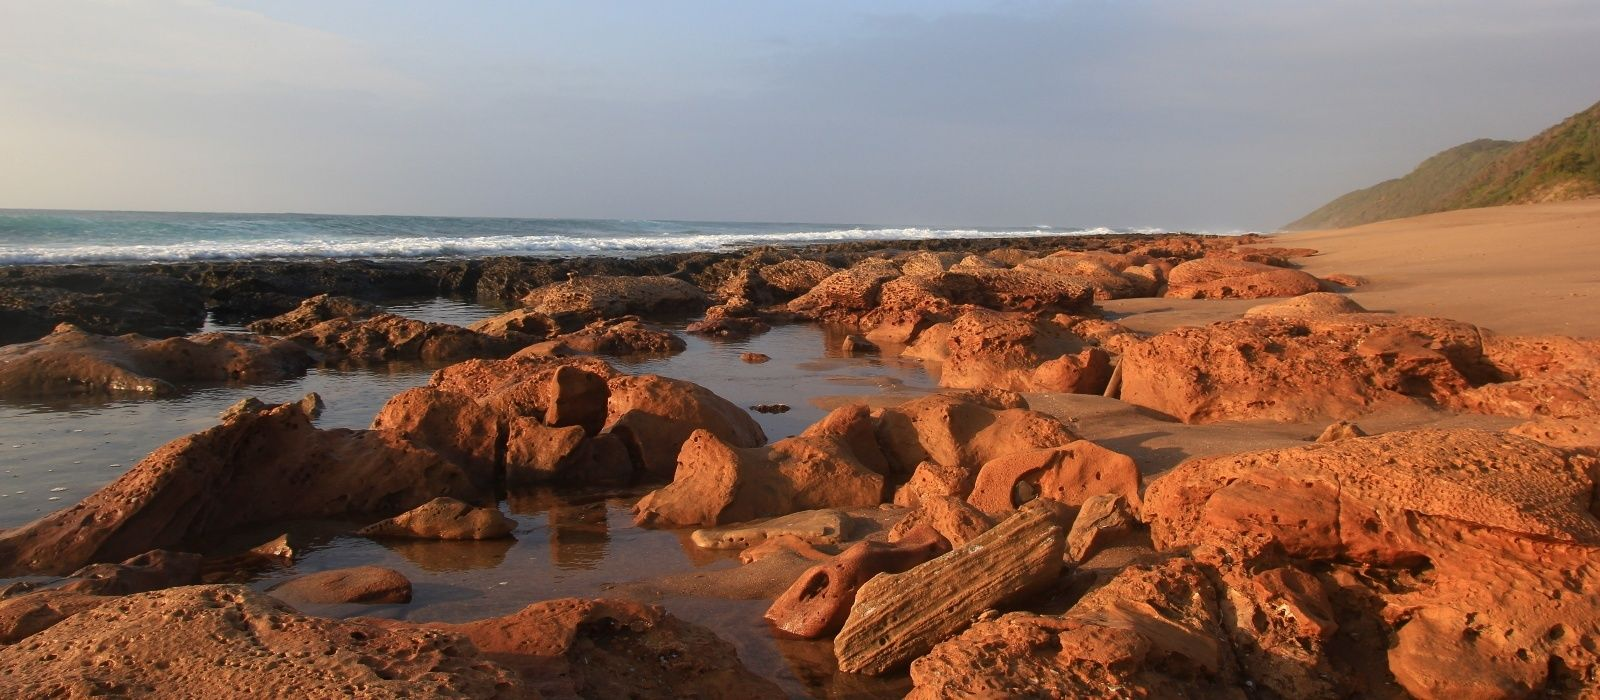 Destination Isimangaliso South Africa